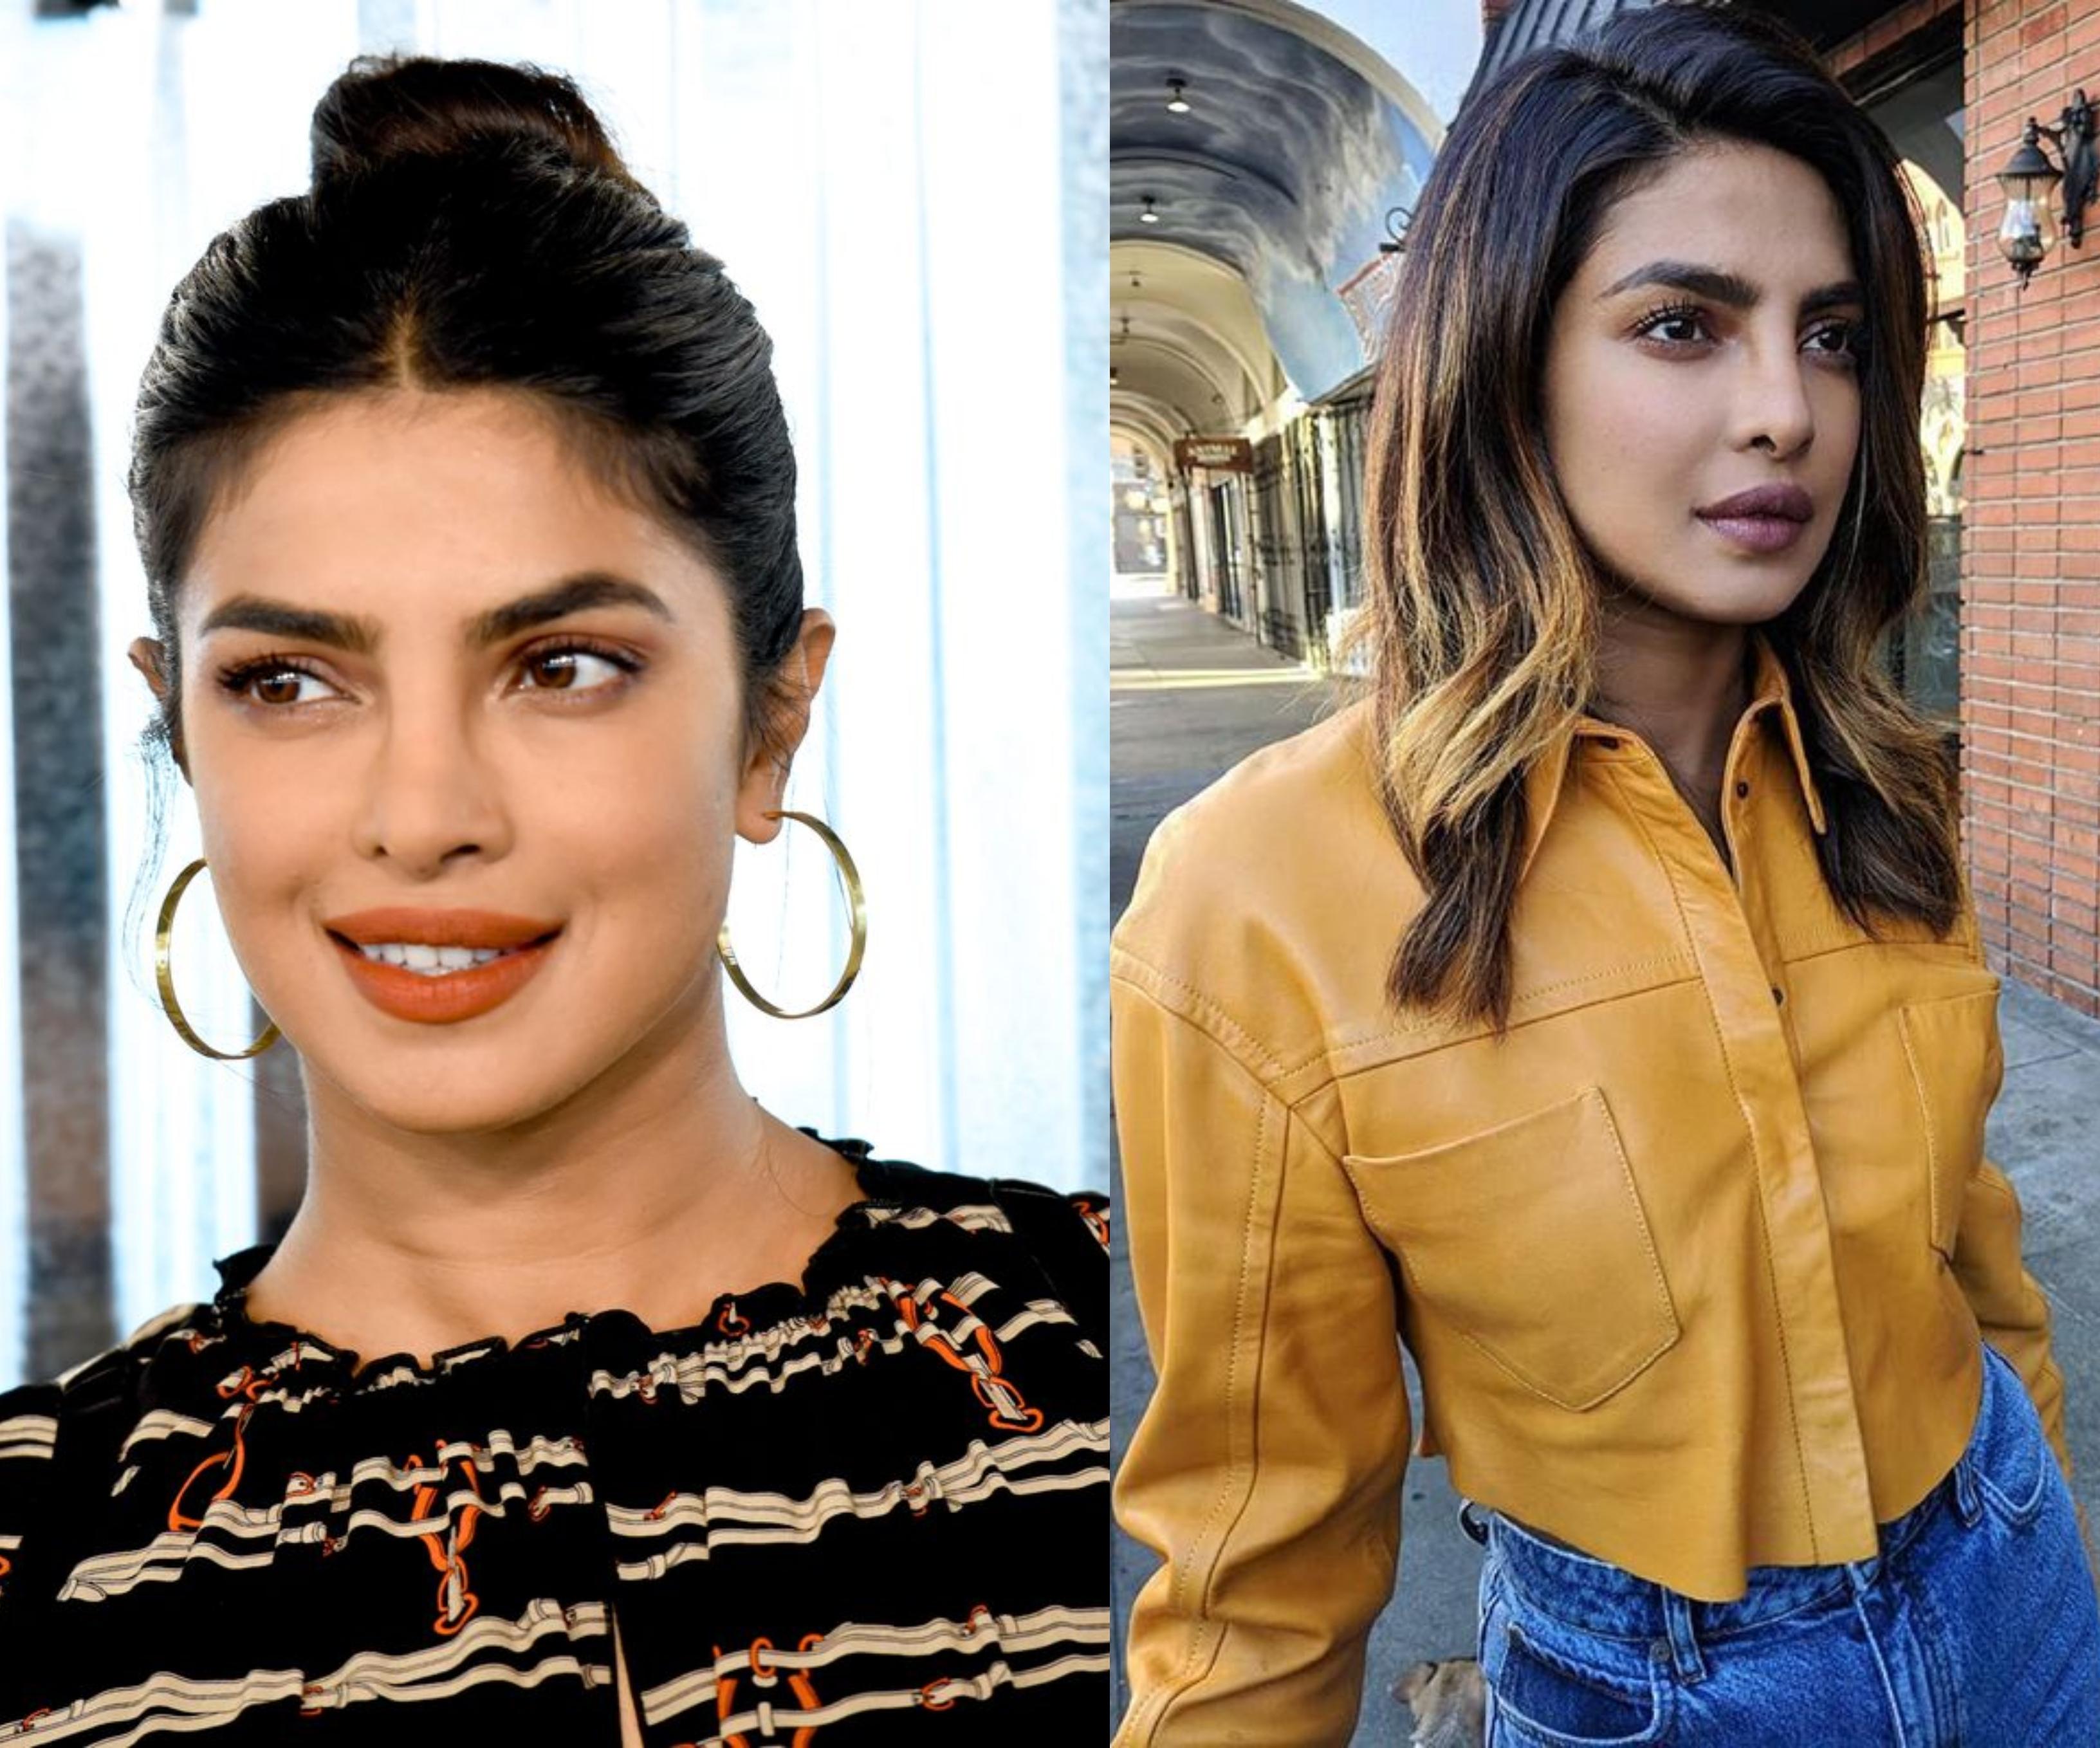 Priyanka Chopra Katalinhoz hasonlóan highlightokkal tűzdelte a haját